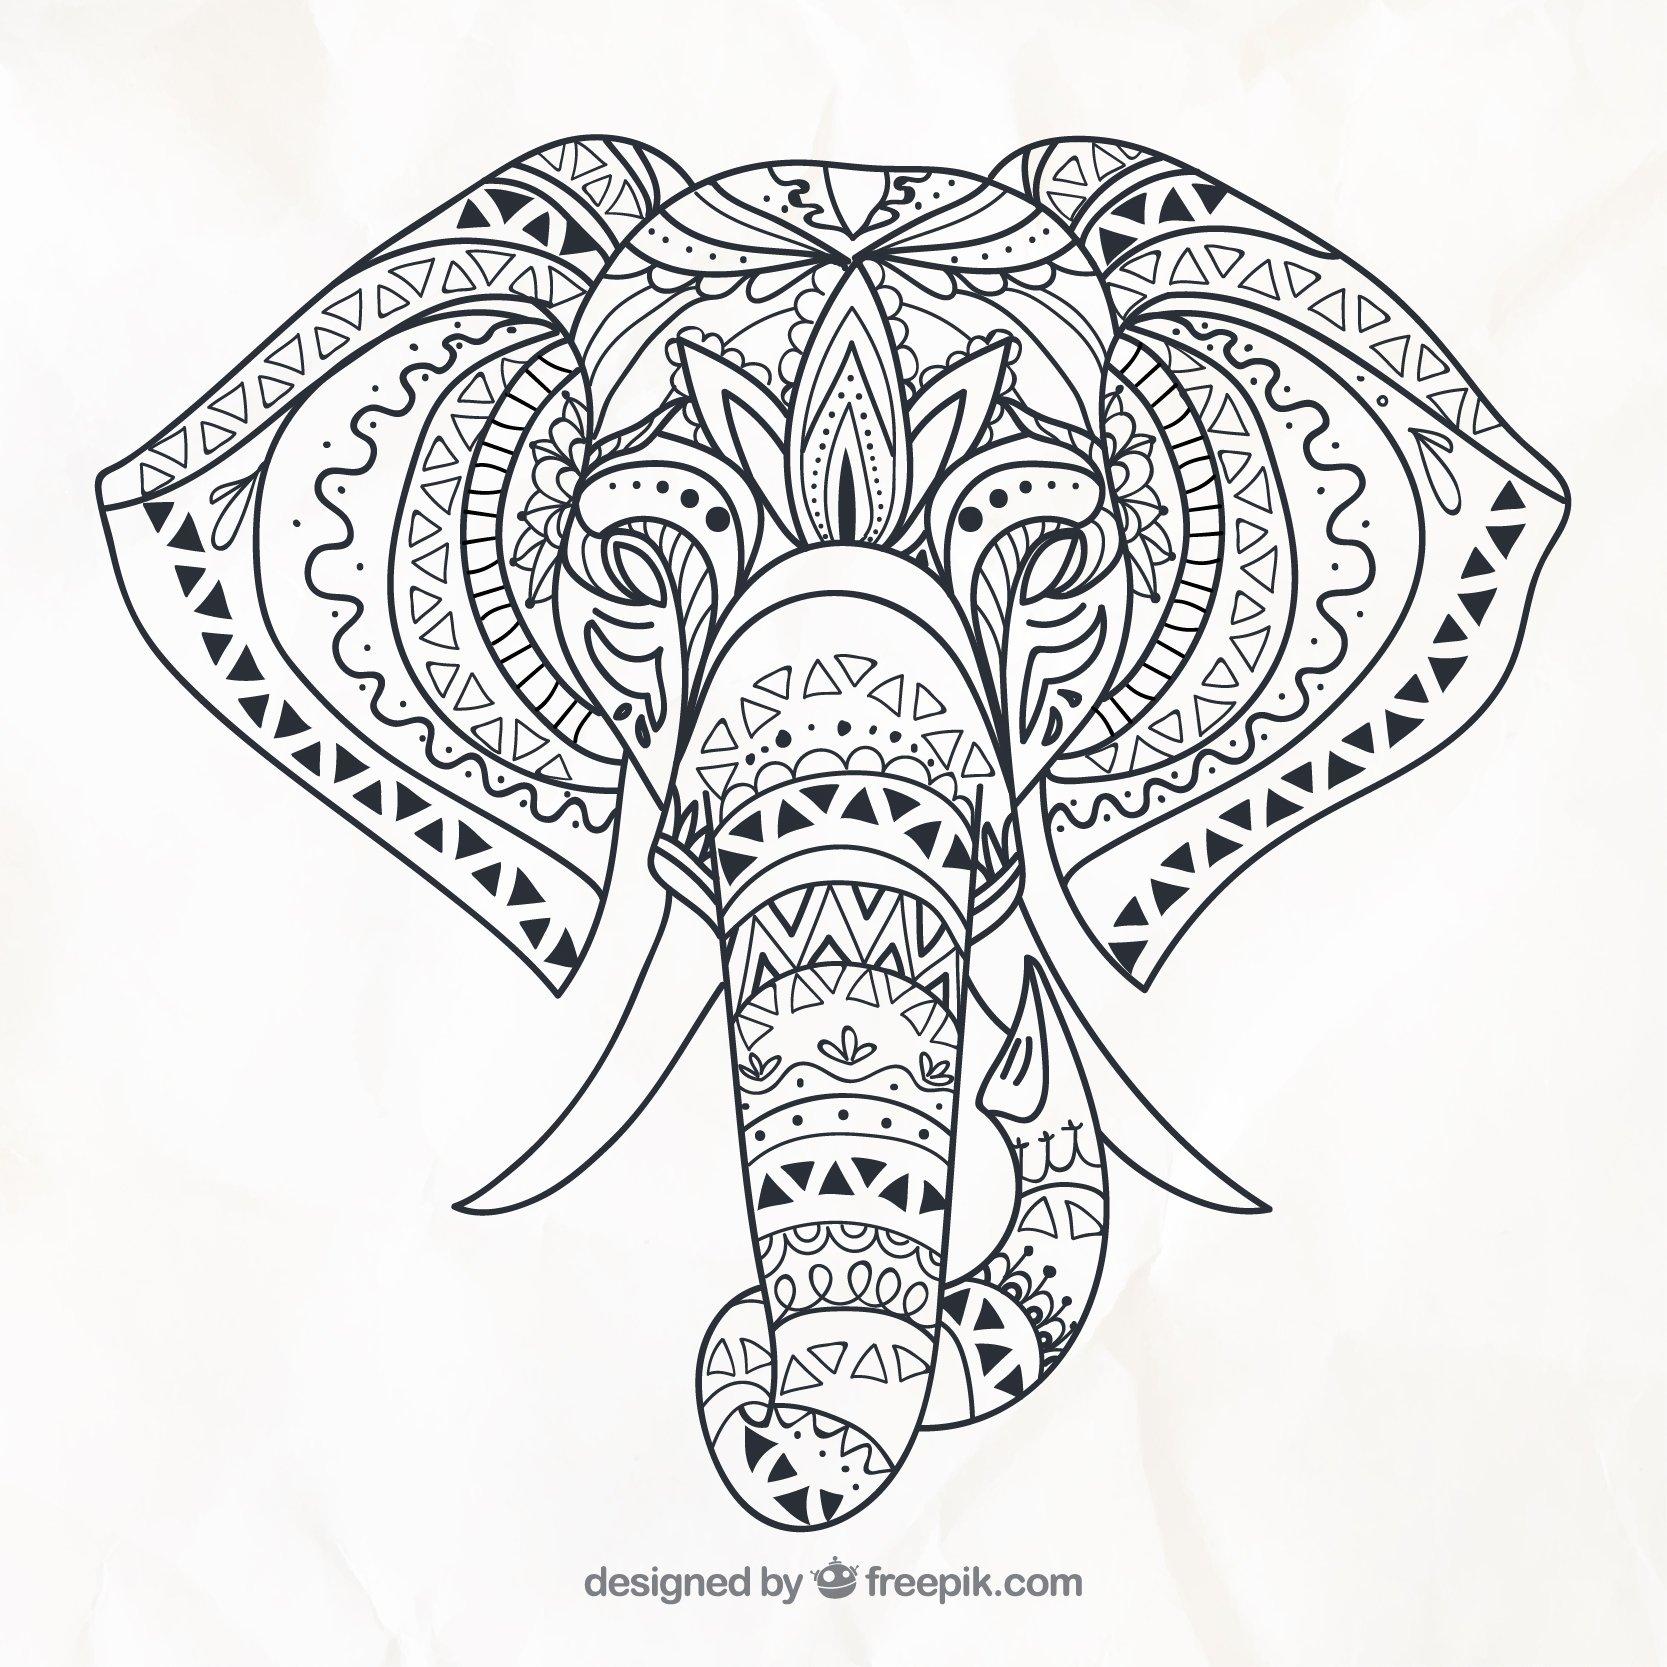 Indian Elephant Line Drawing Kolorowanka antystreso...